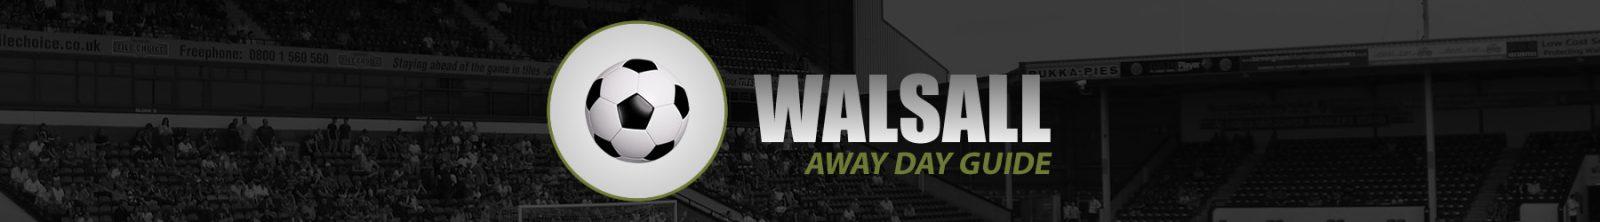 Walsall Away